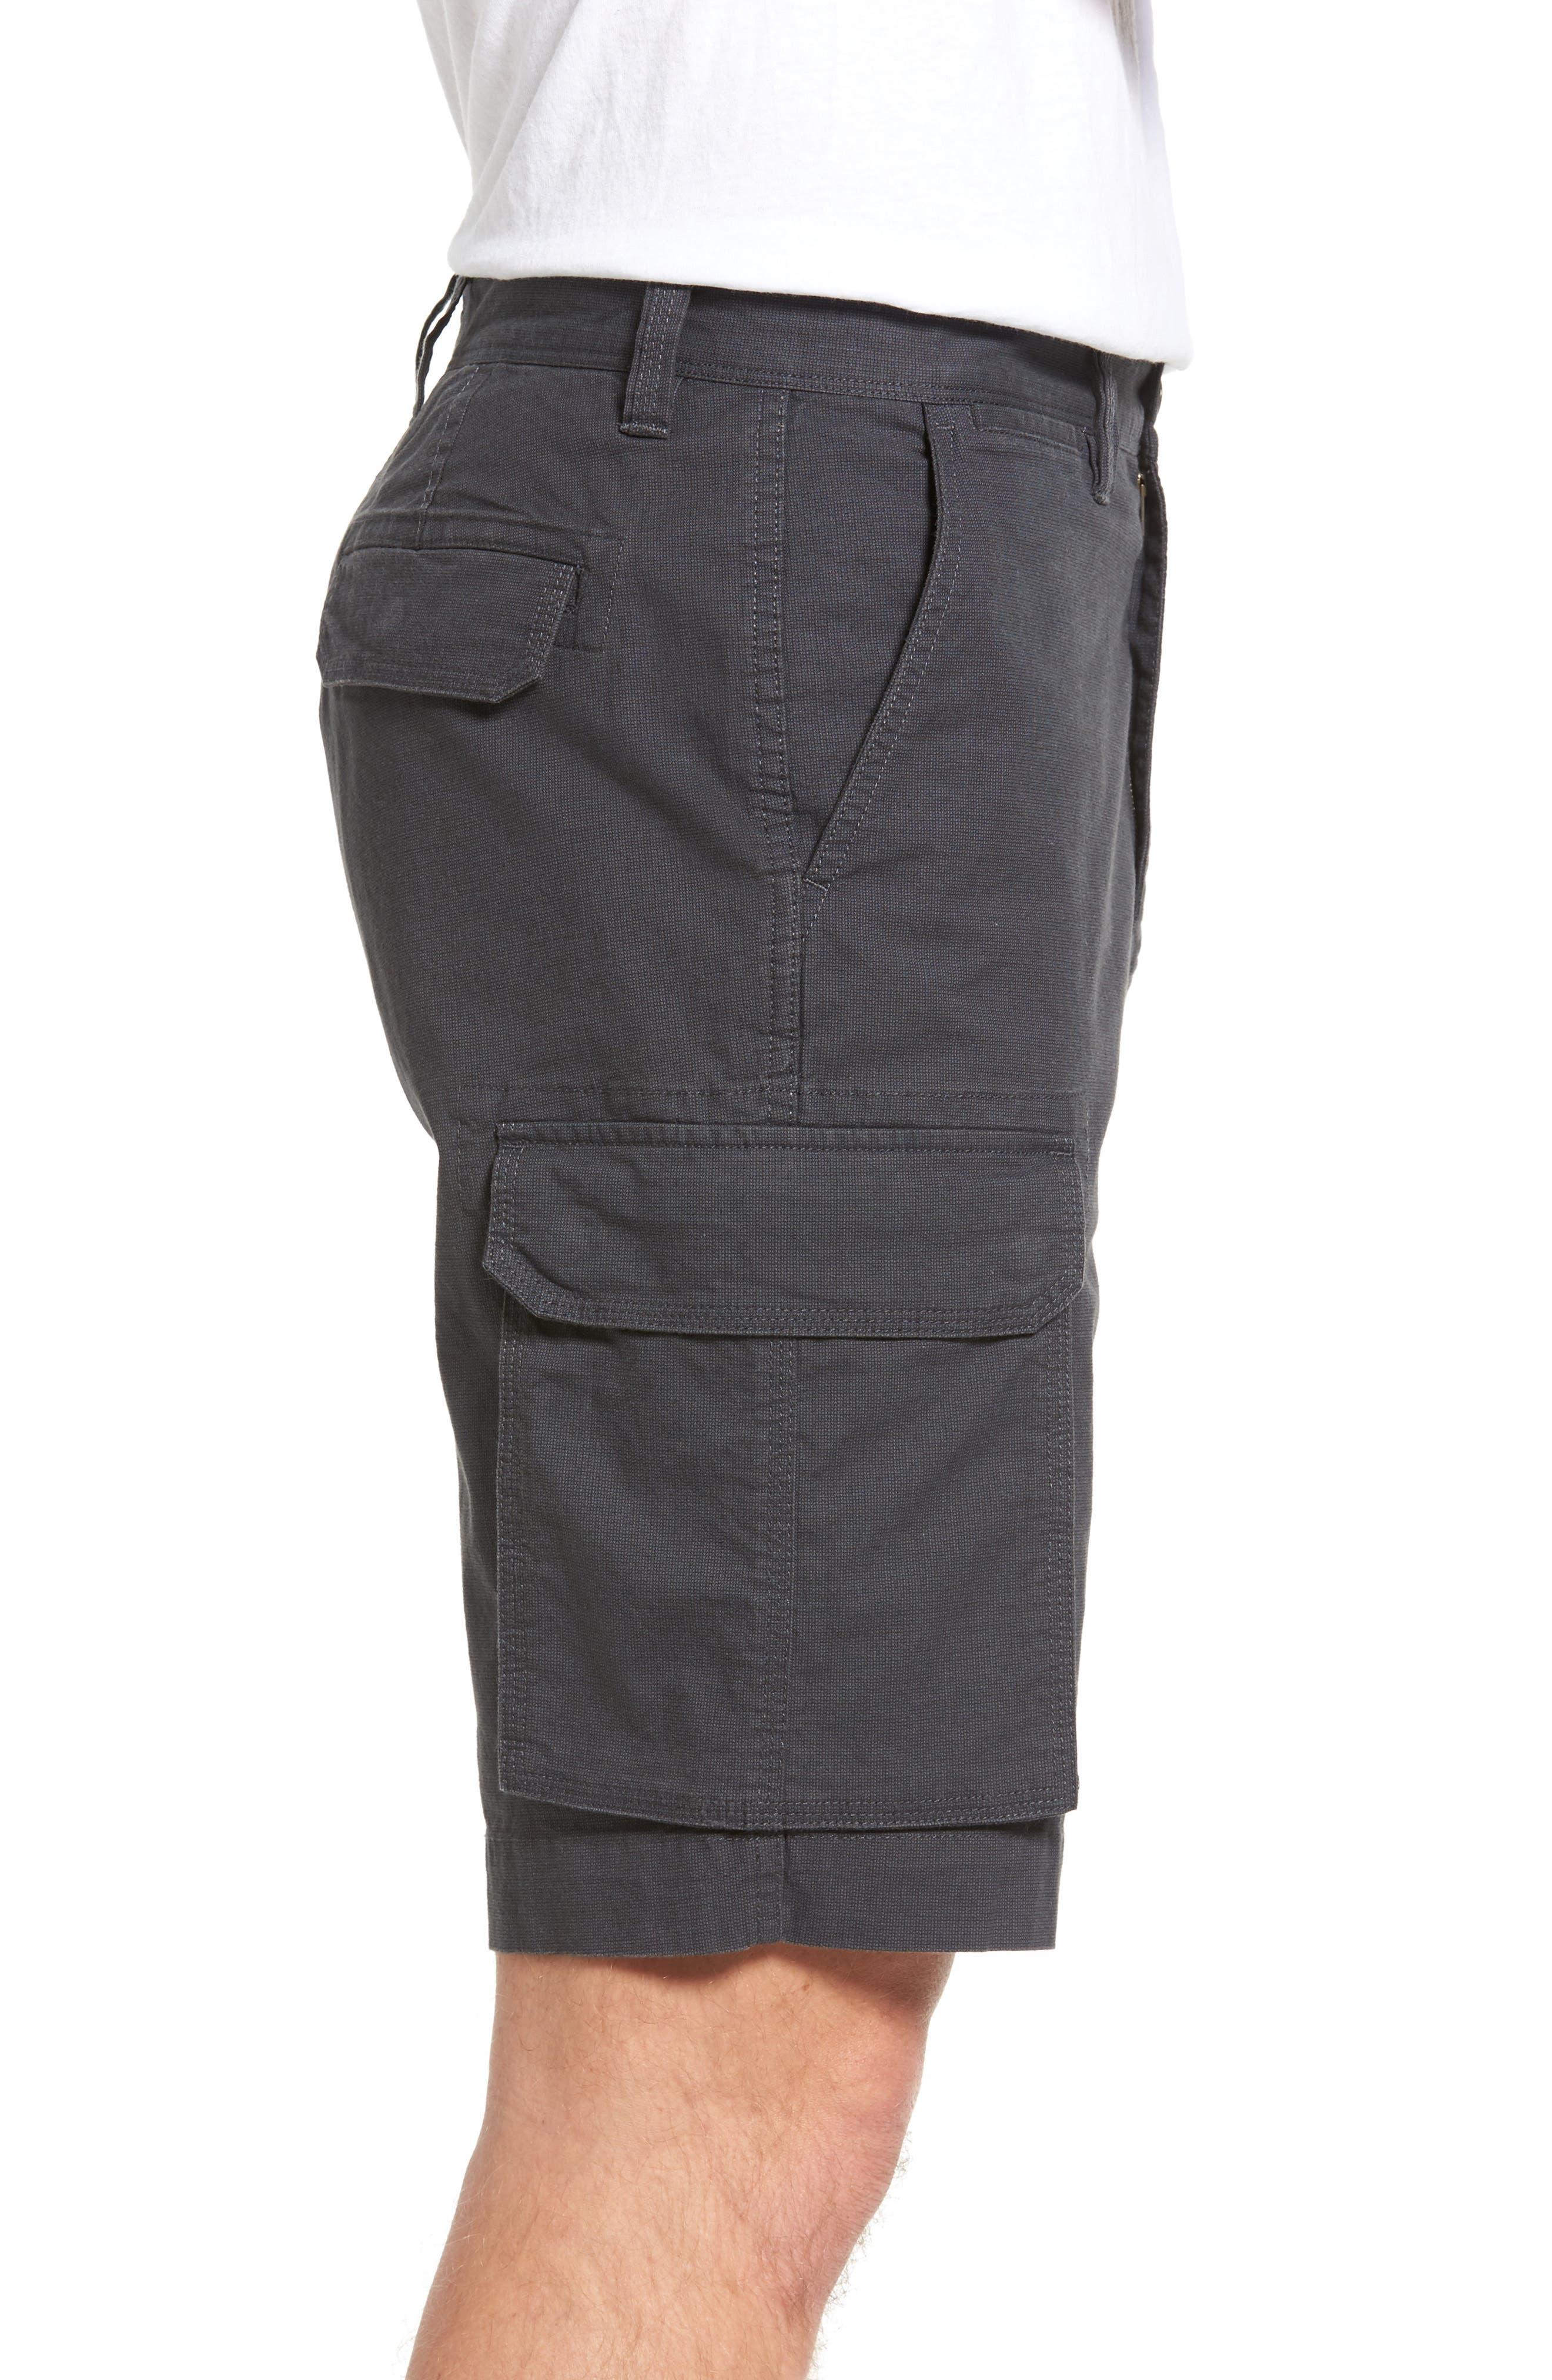 Ludstone Cargo Shorts,                             Alternate thumbnail 3, color,                             Blue Graphite